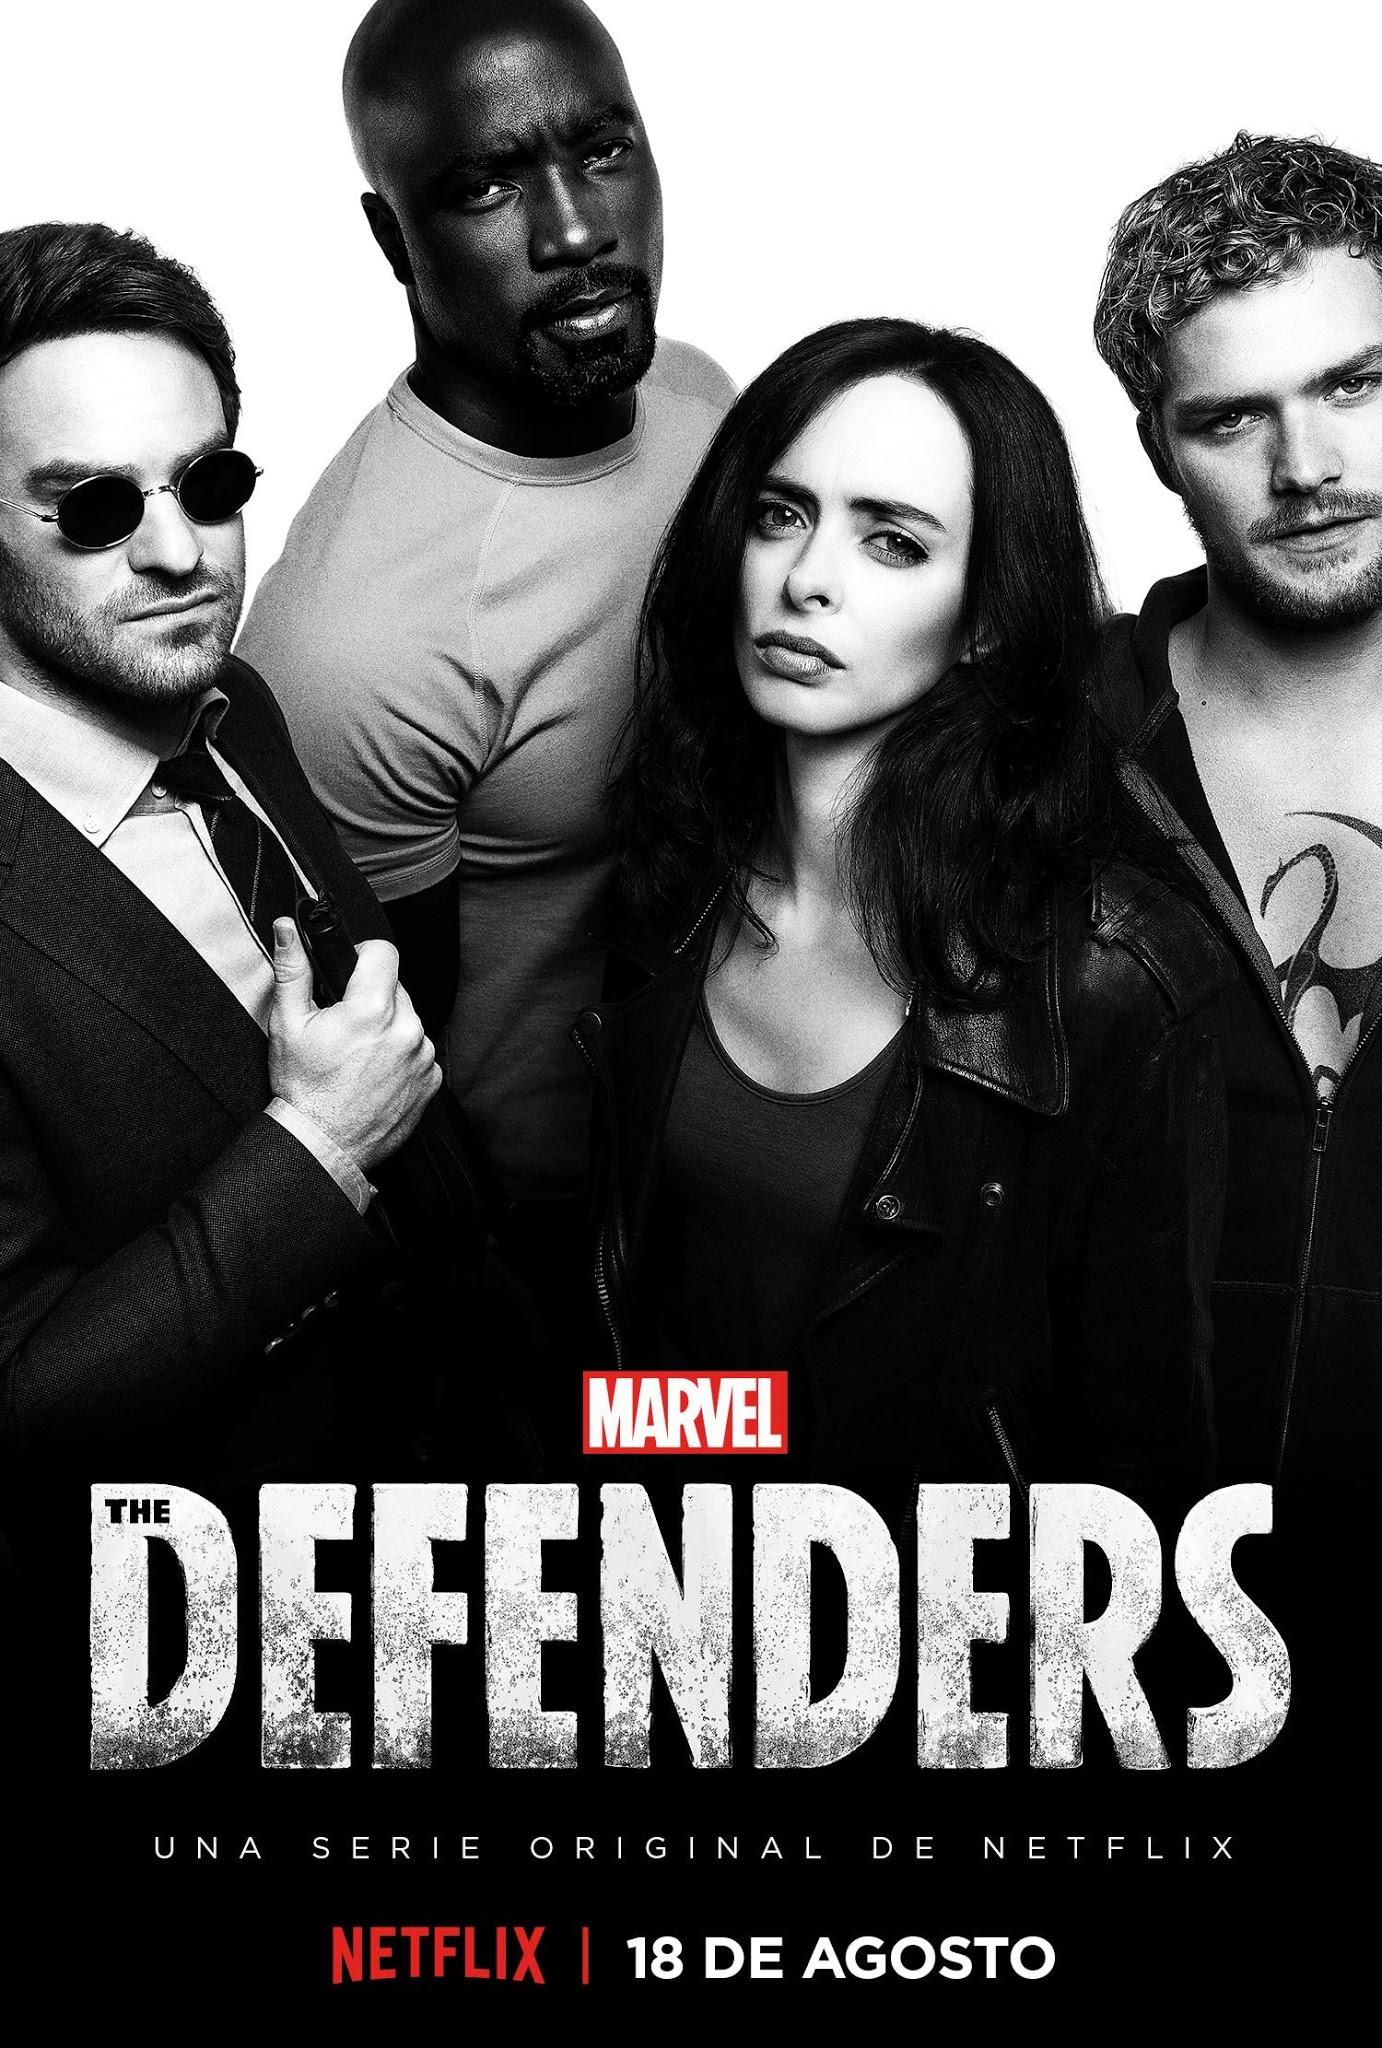 The Defenders (2017)